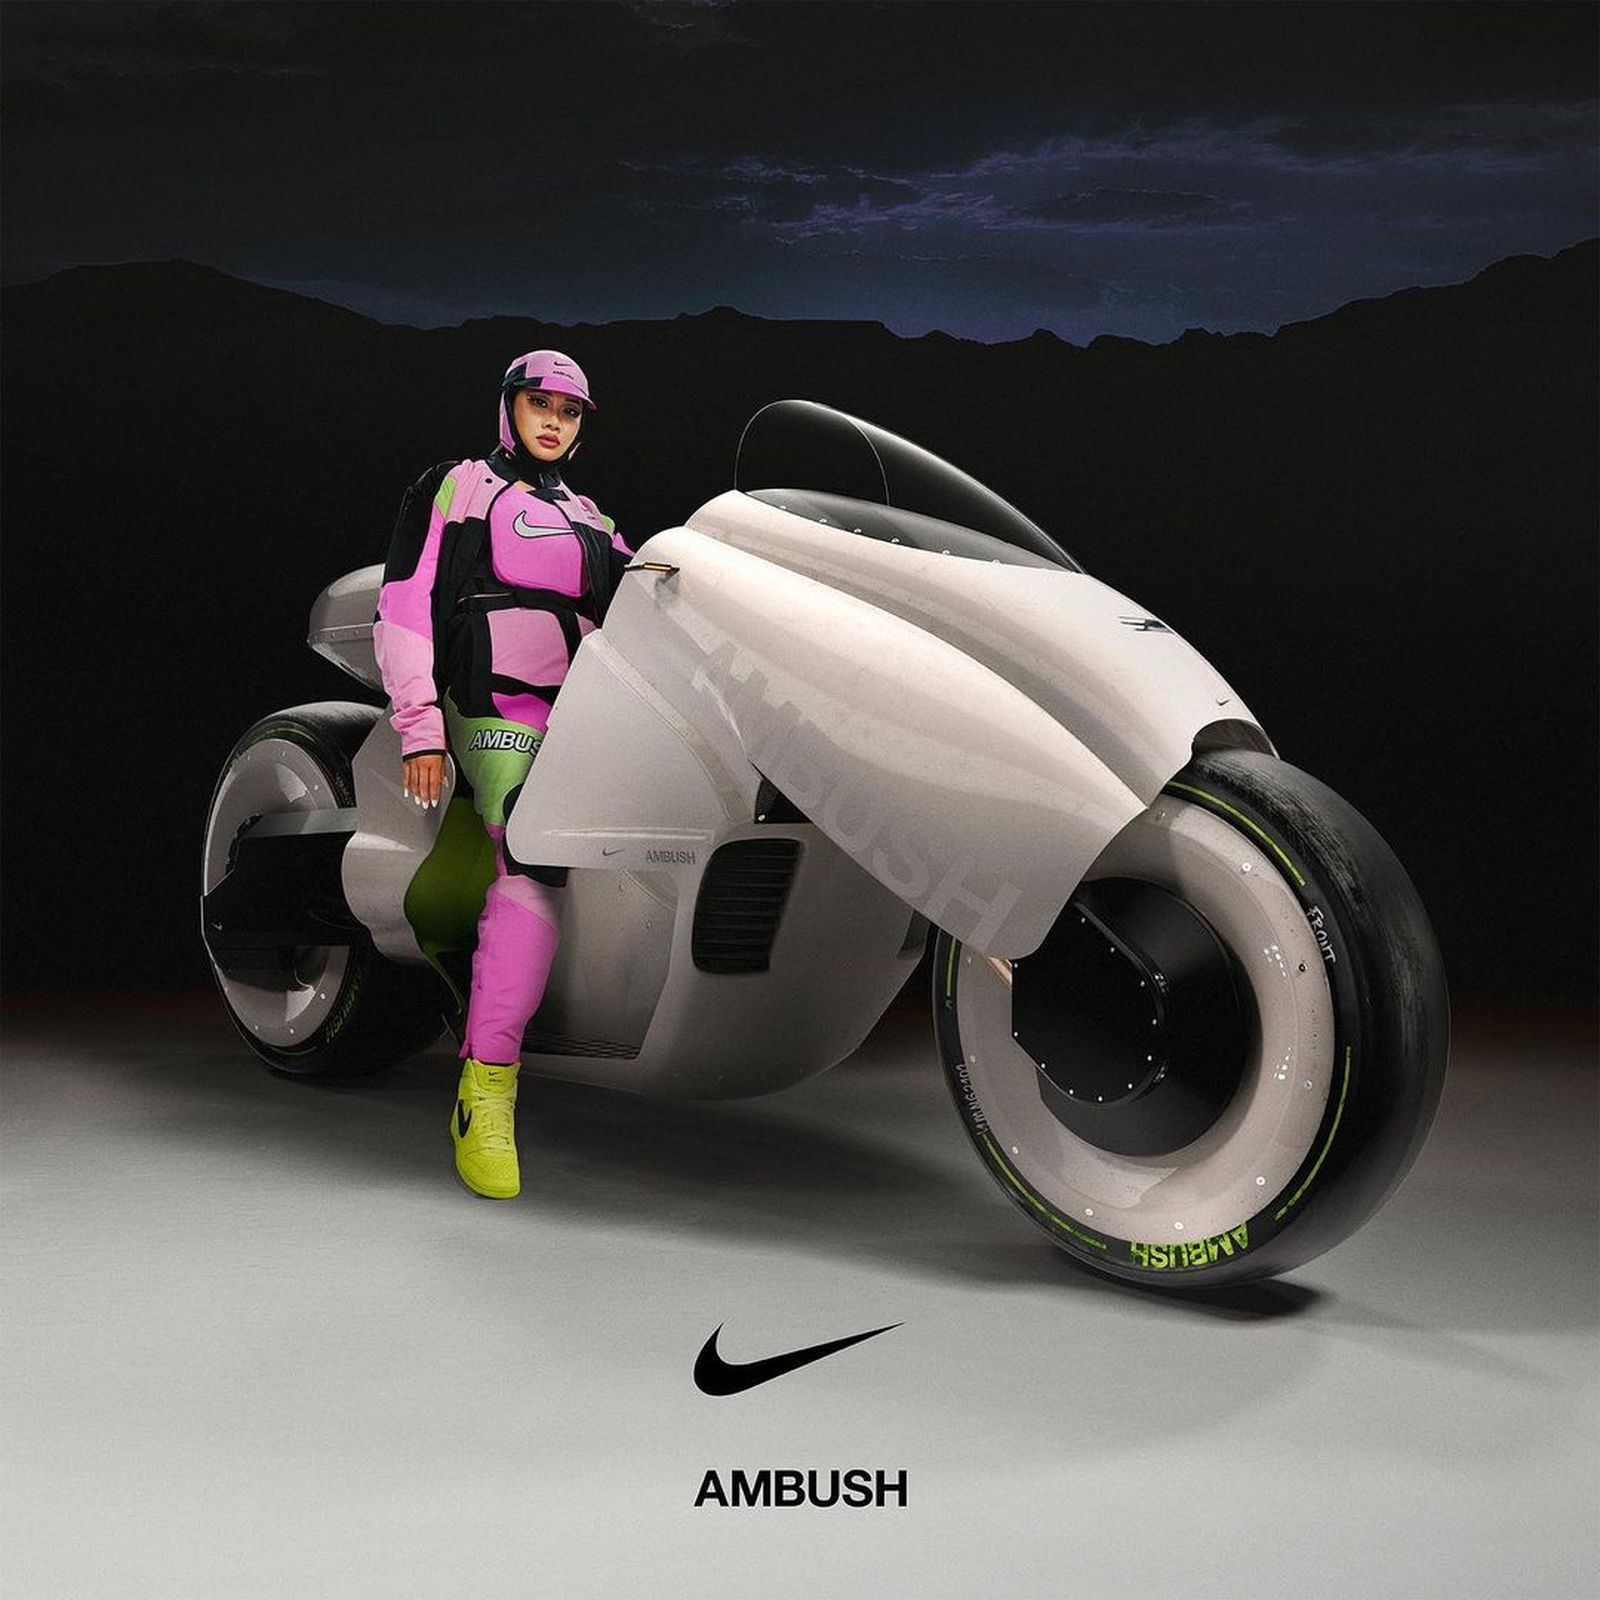 nike-ambush-megan-thee-stallion-campaign-5